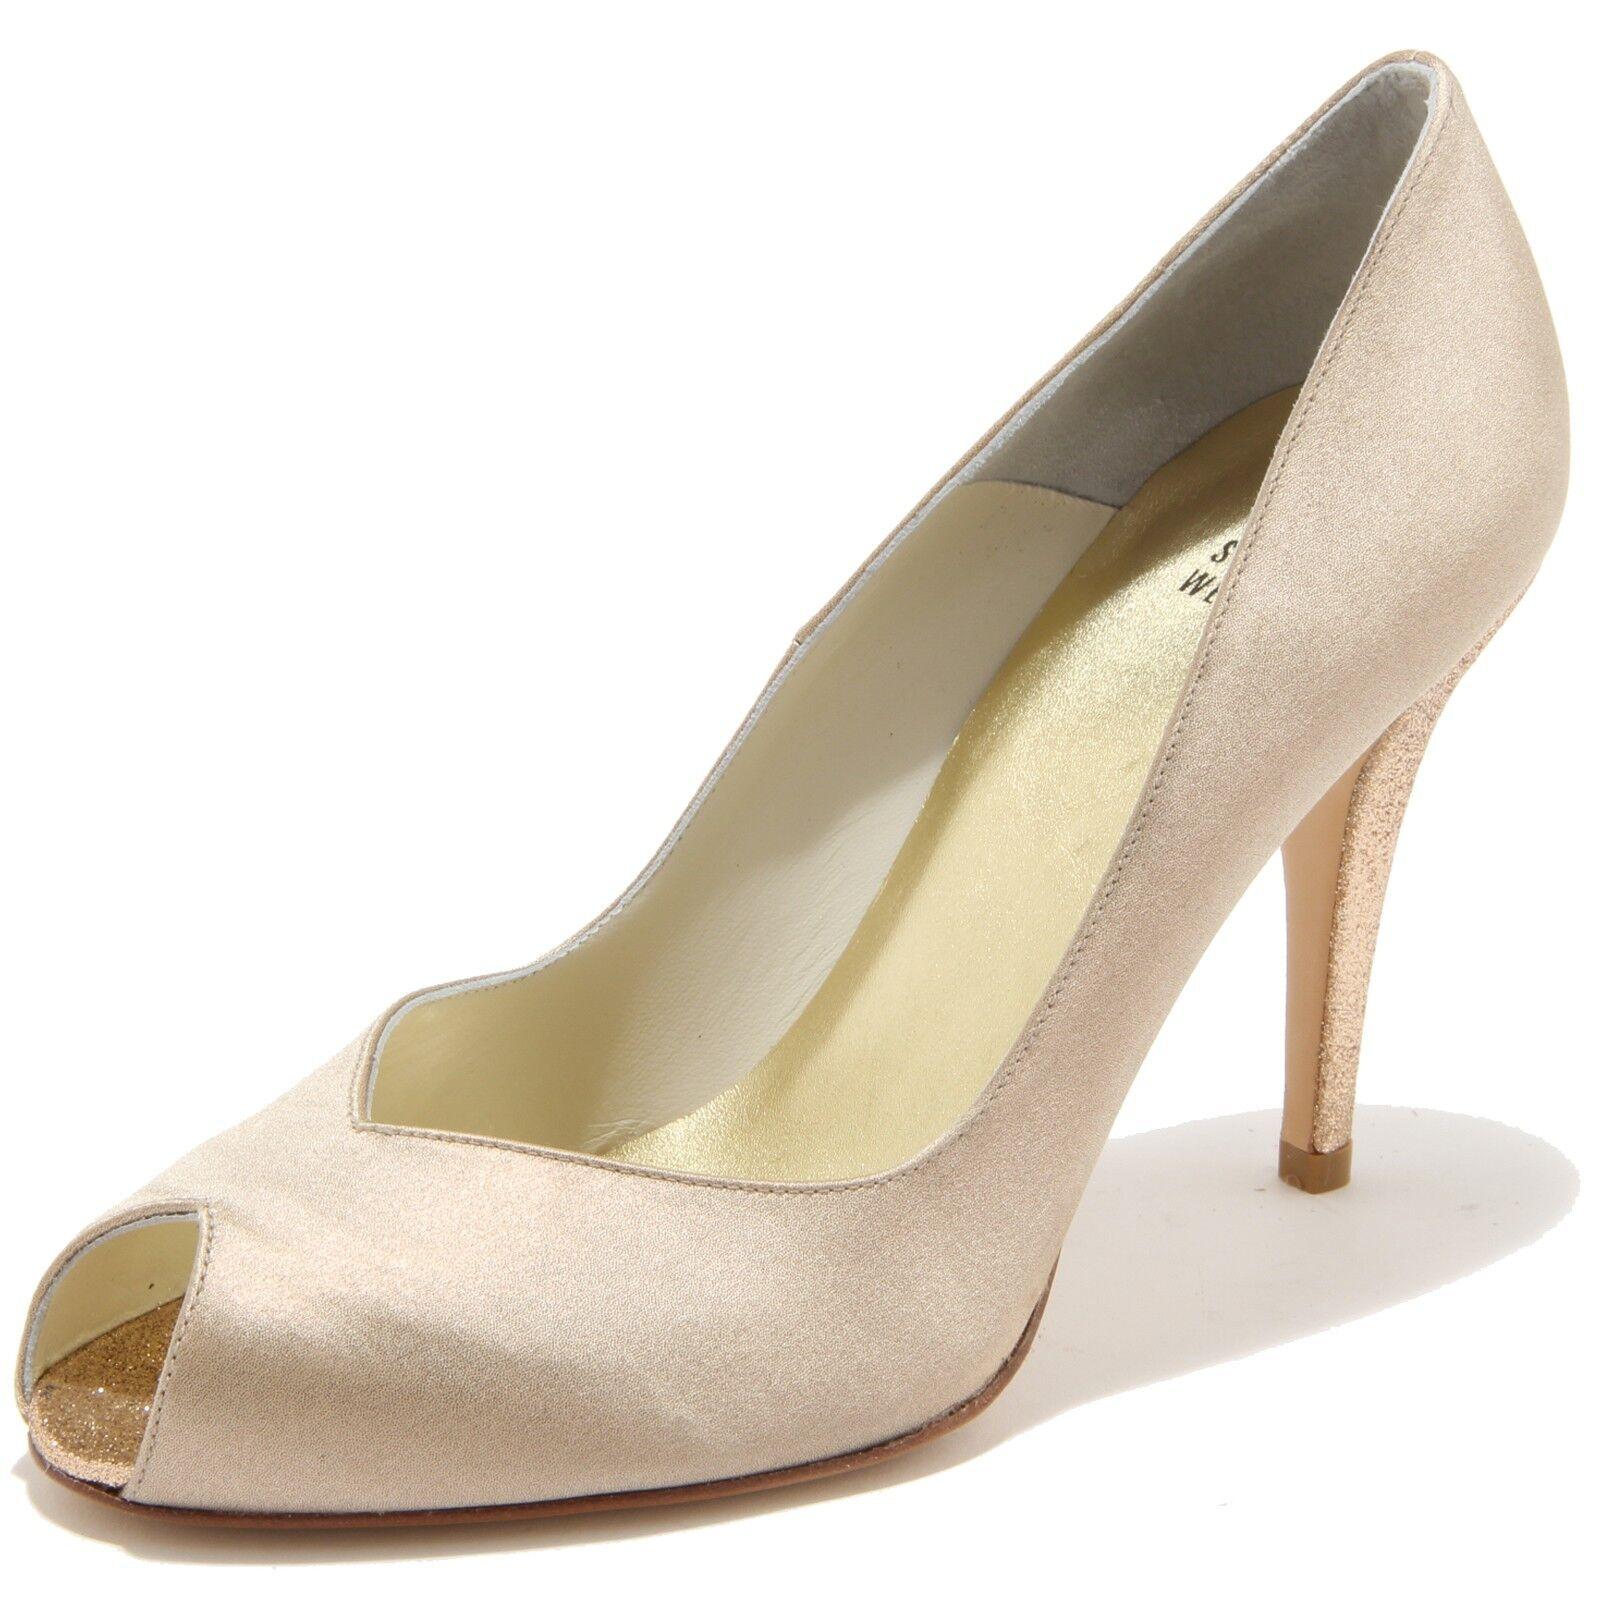 86101 decollete spuntato STUART WEITZMAN  scarpa donna shoes Donna